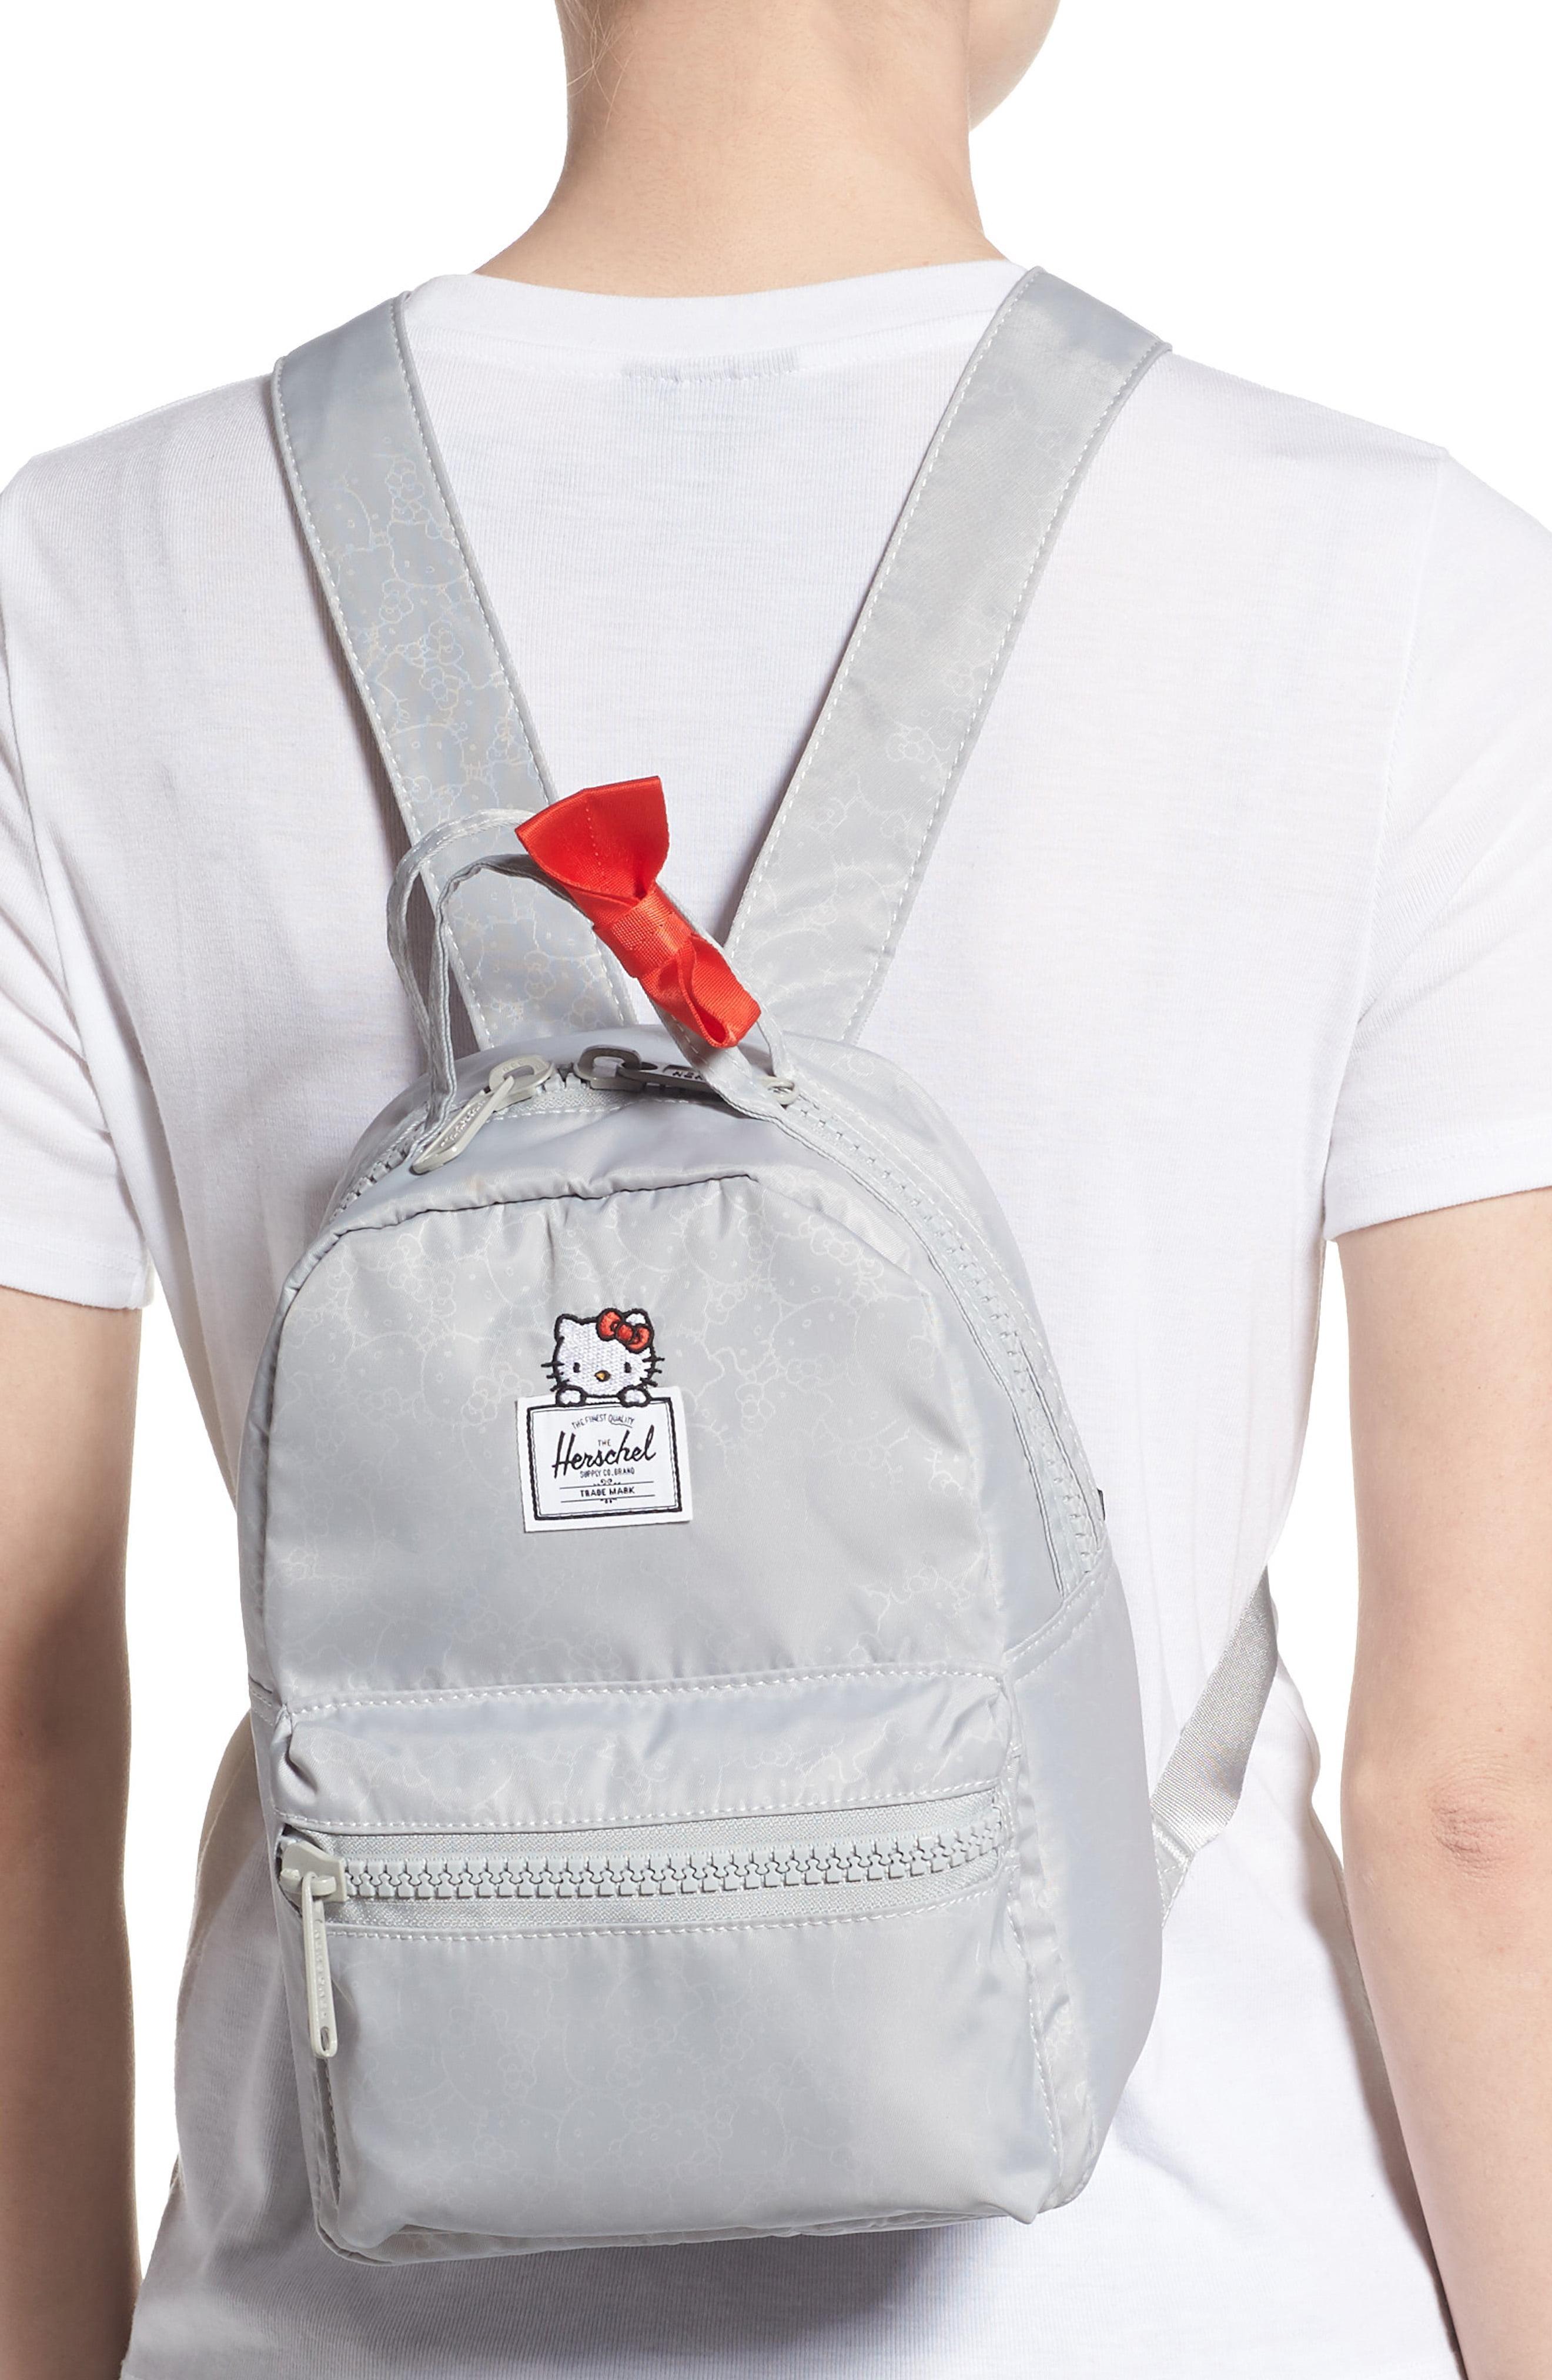 627c6ddf5 Herschel Supply Co. X Hello Kitty Mini Nova Backpack - in Black - Lyst